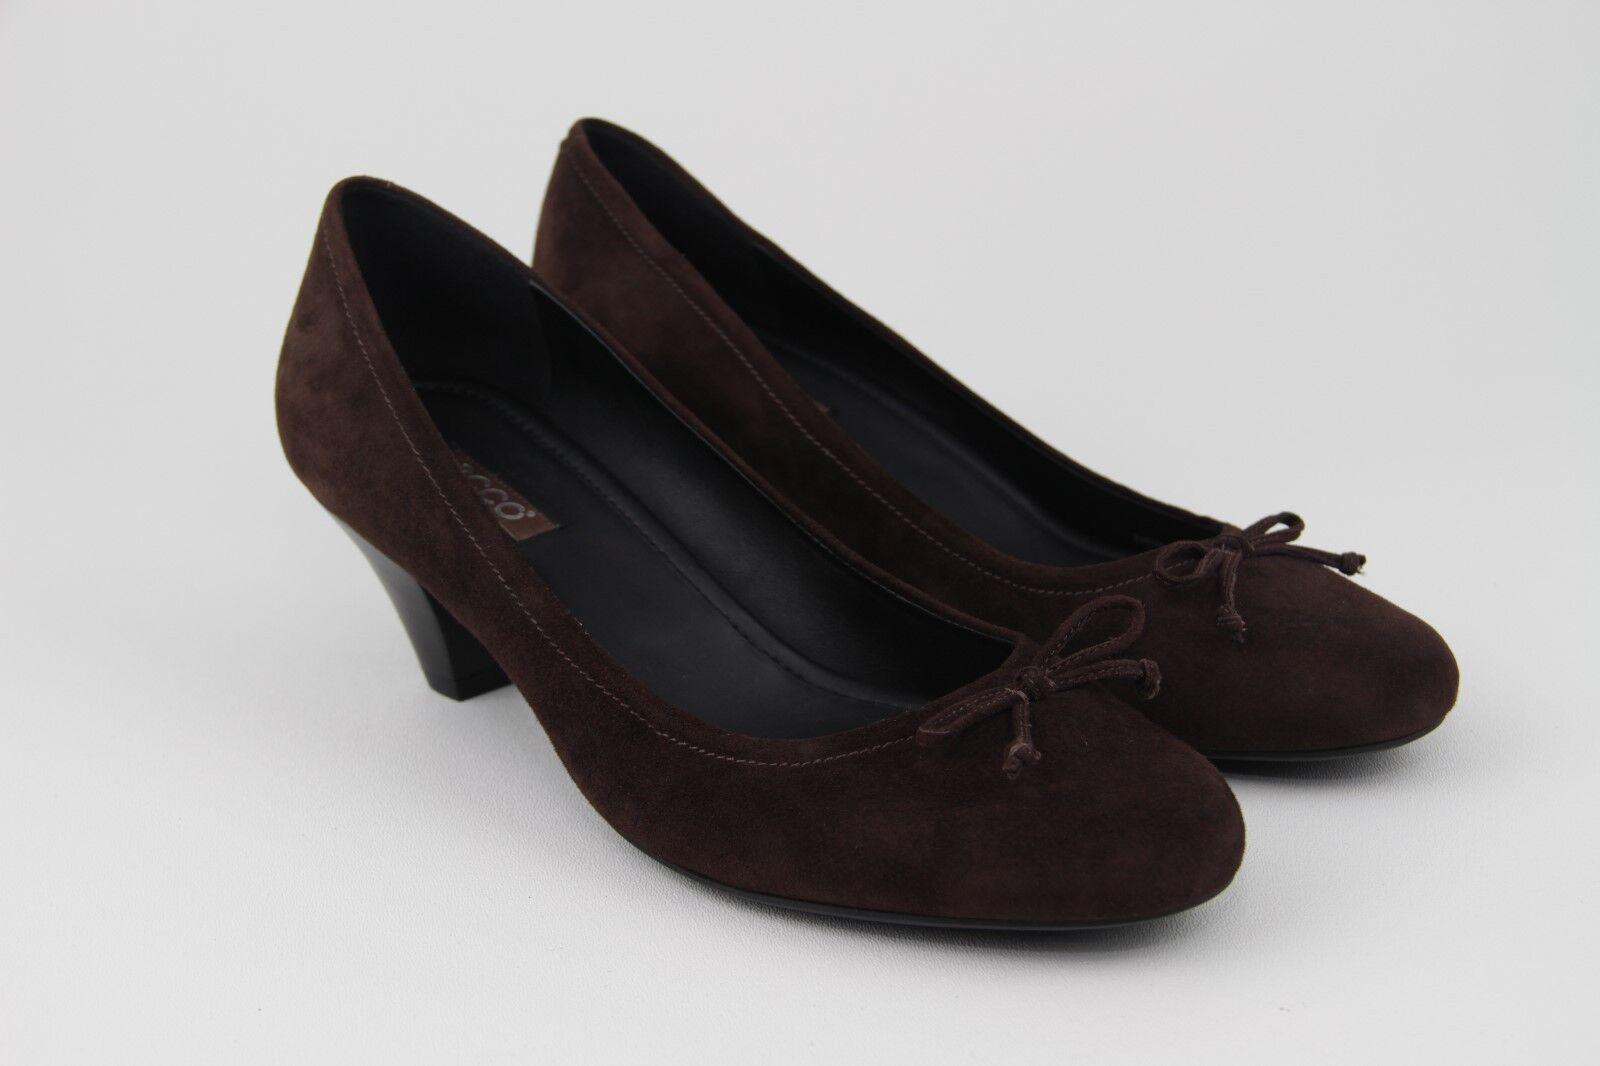 Ecco Chaussures Femmes Café Cafe Mules Talons Taille 41 EUR 10-10.5 US (OBO)